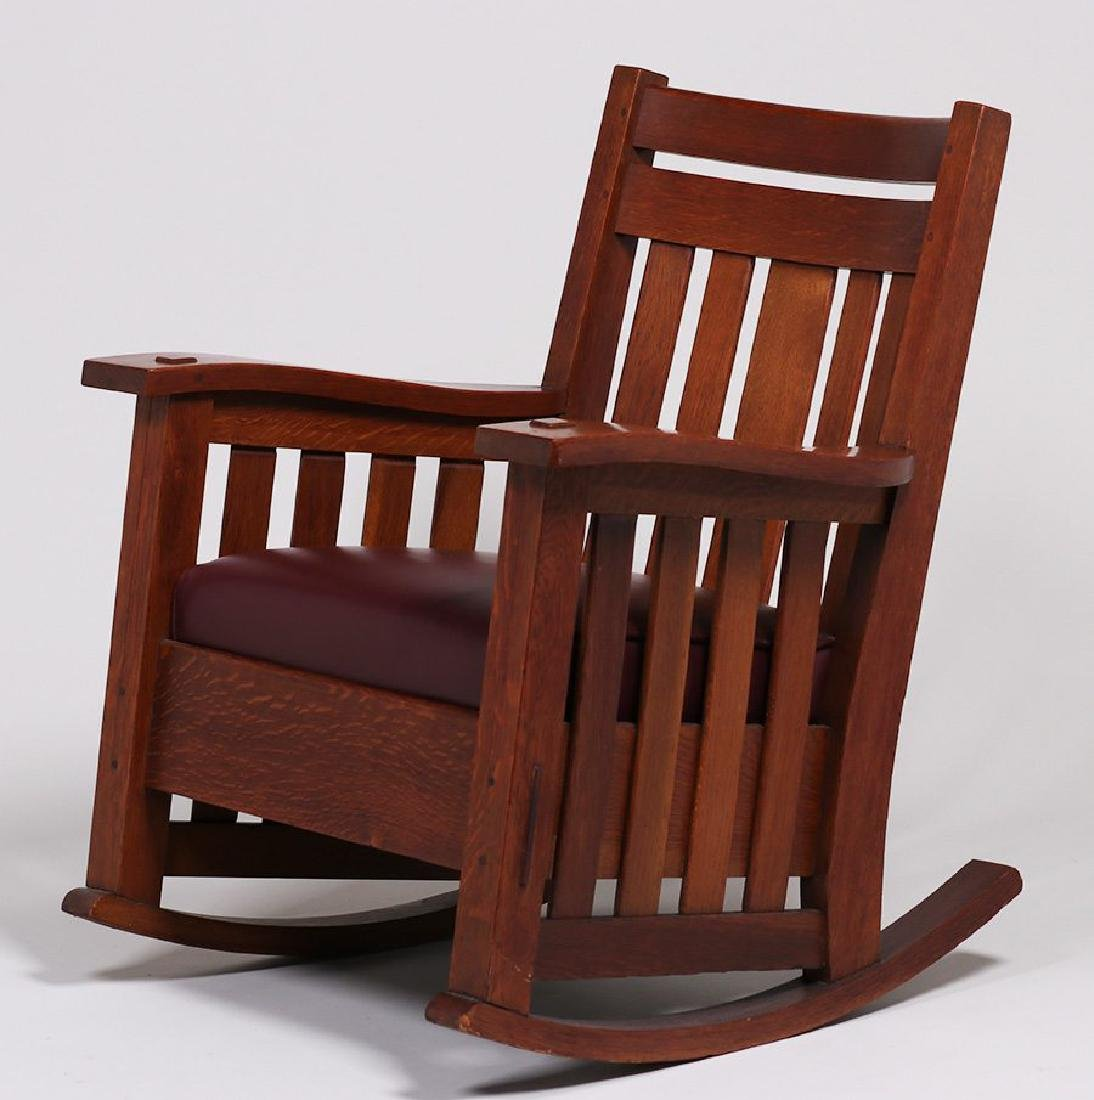 Harden Furniture Co Rocker (Match to Lot 184)